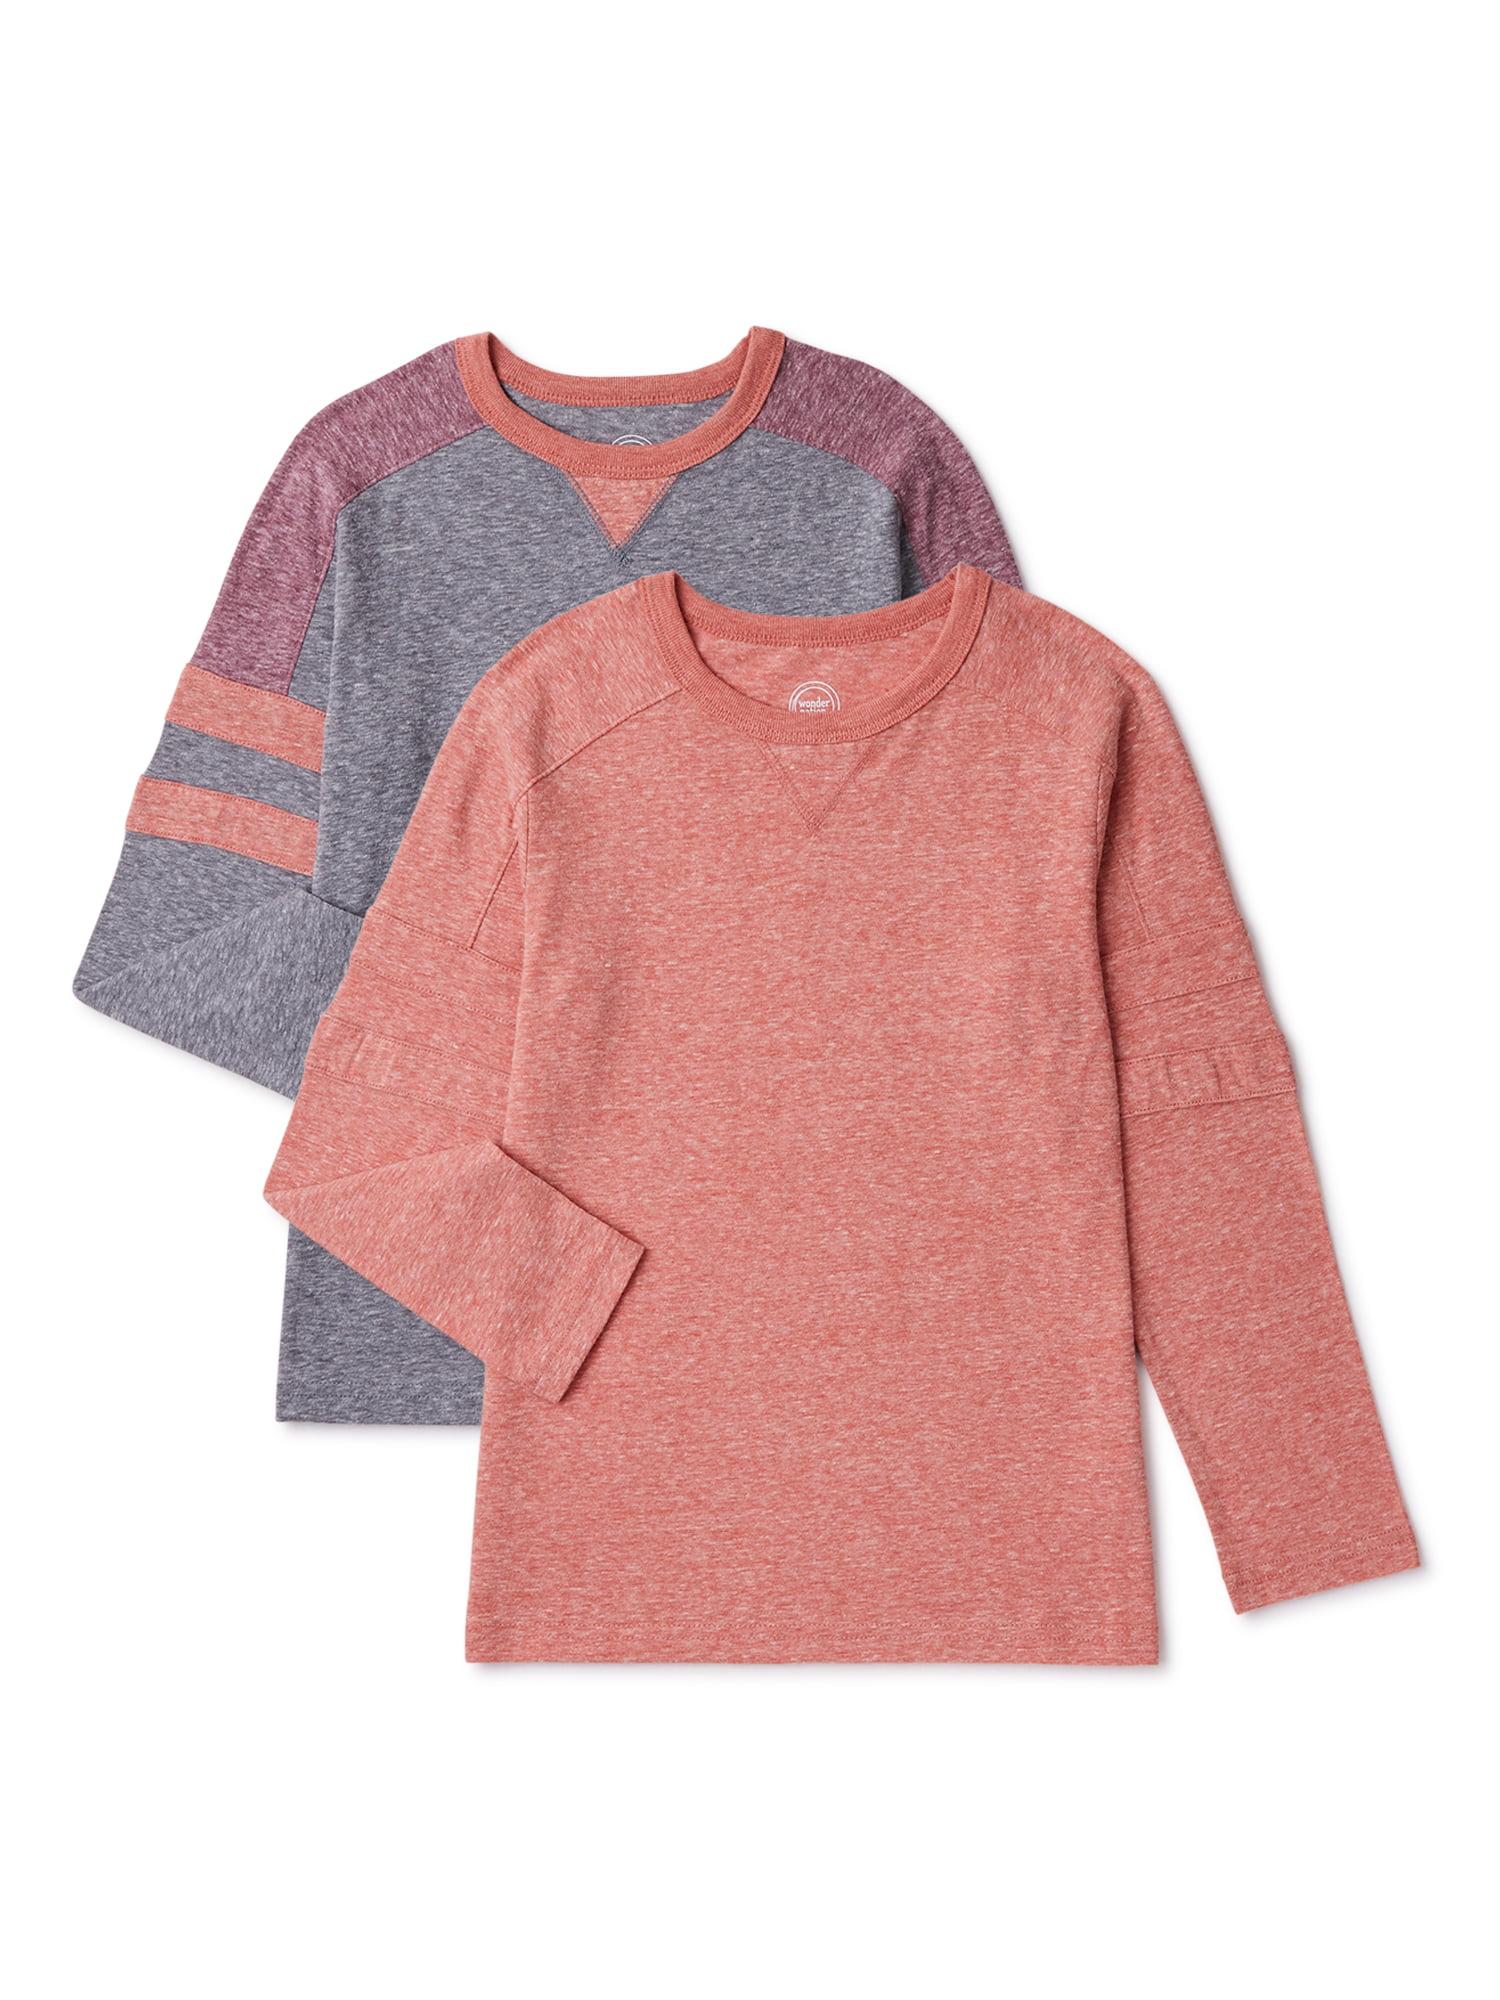 Wonder Nation Boys Sleeve Stripe Long Sleeve T-Shirt 2 Pack Sizes 4-18 & Husky